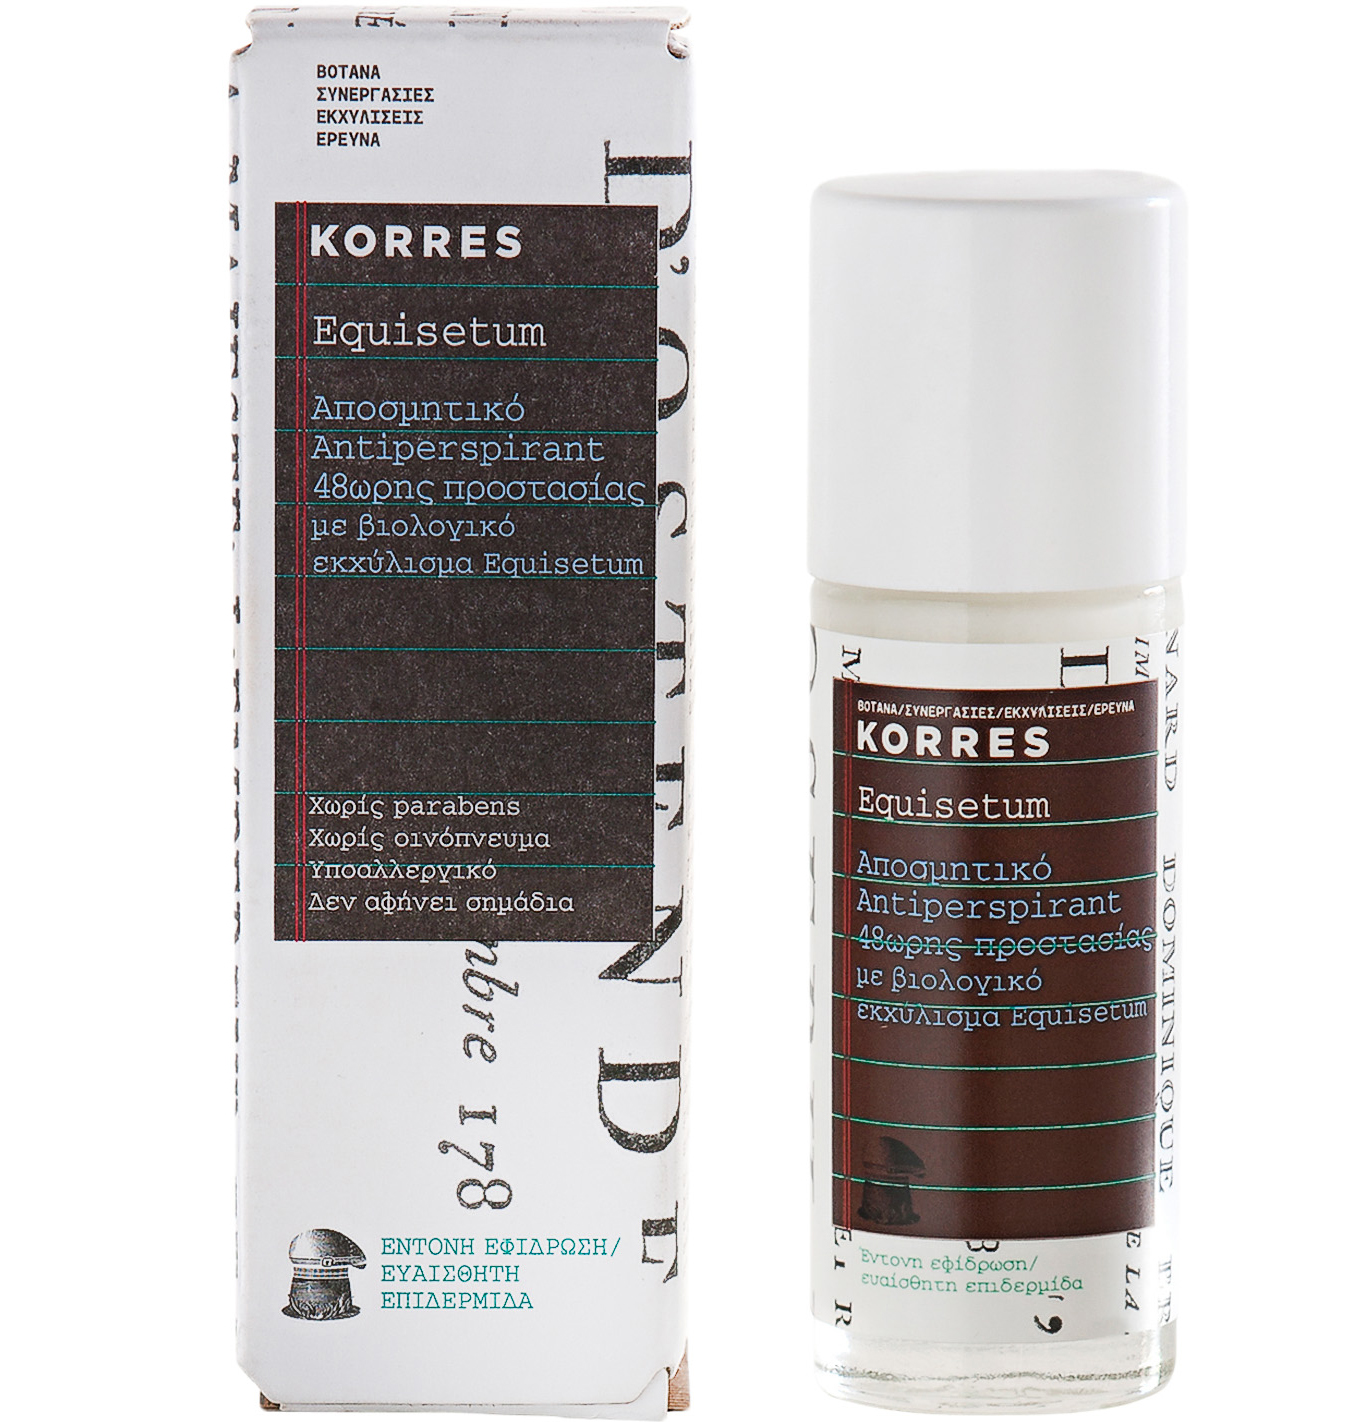 Korres Αποσμητικό Antiperspirant 48ωρης Προστασίας με Άρωμα Έντονη Εφίδρωση 30ml